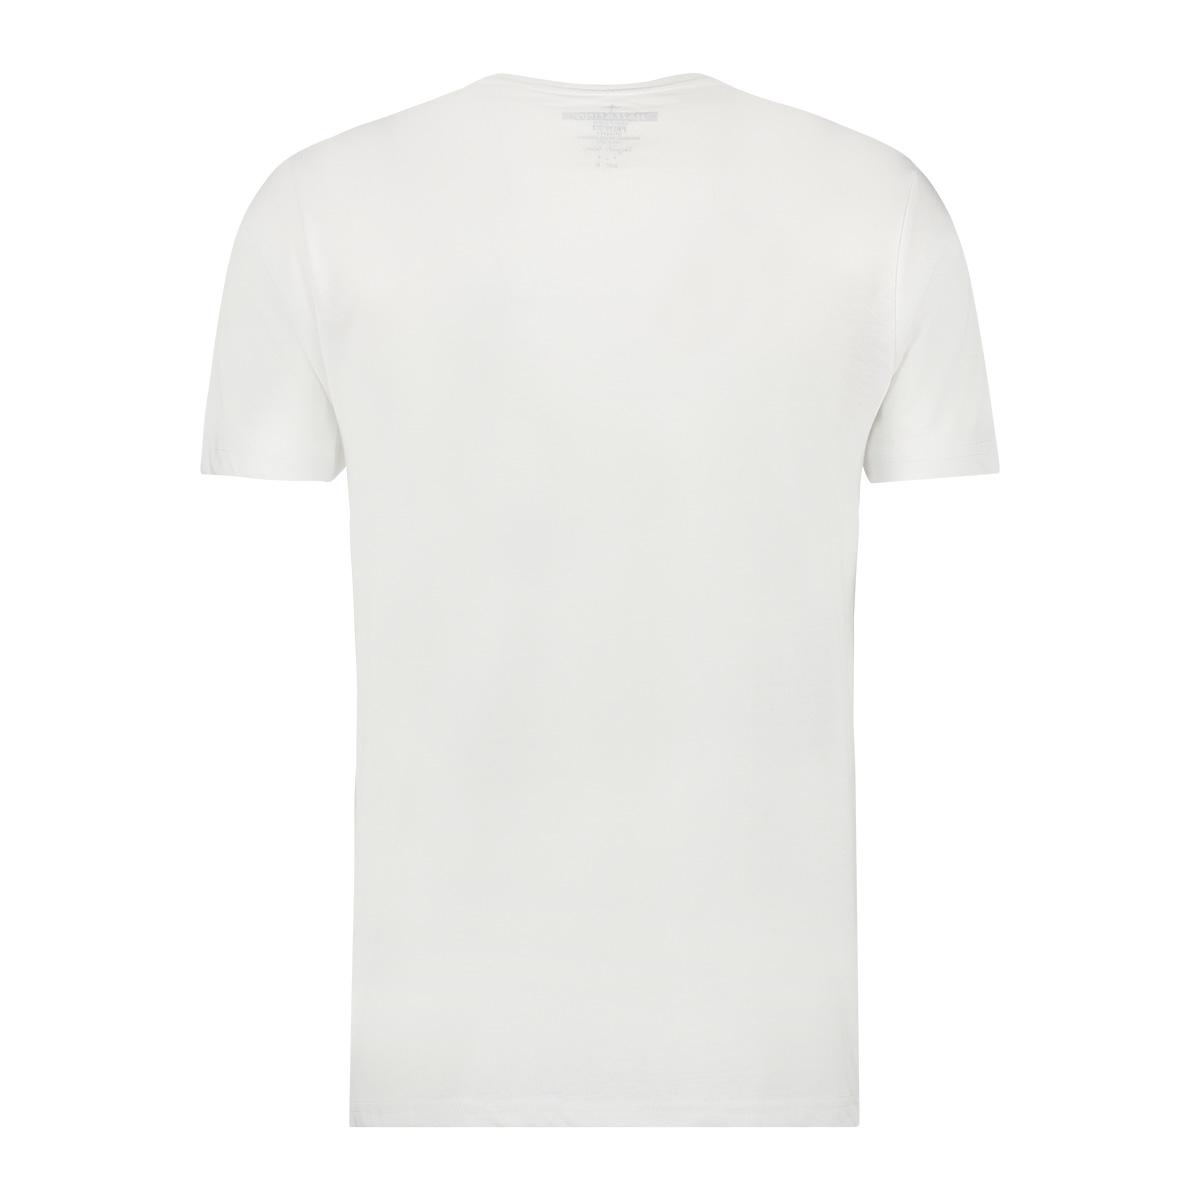 tee husky vintage mu12 0007 haze & finn t-shirt off white